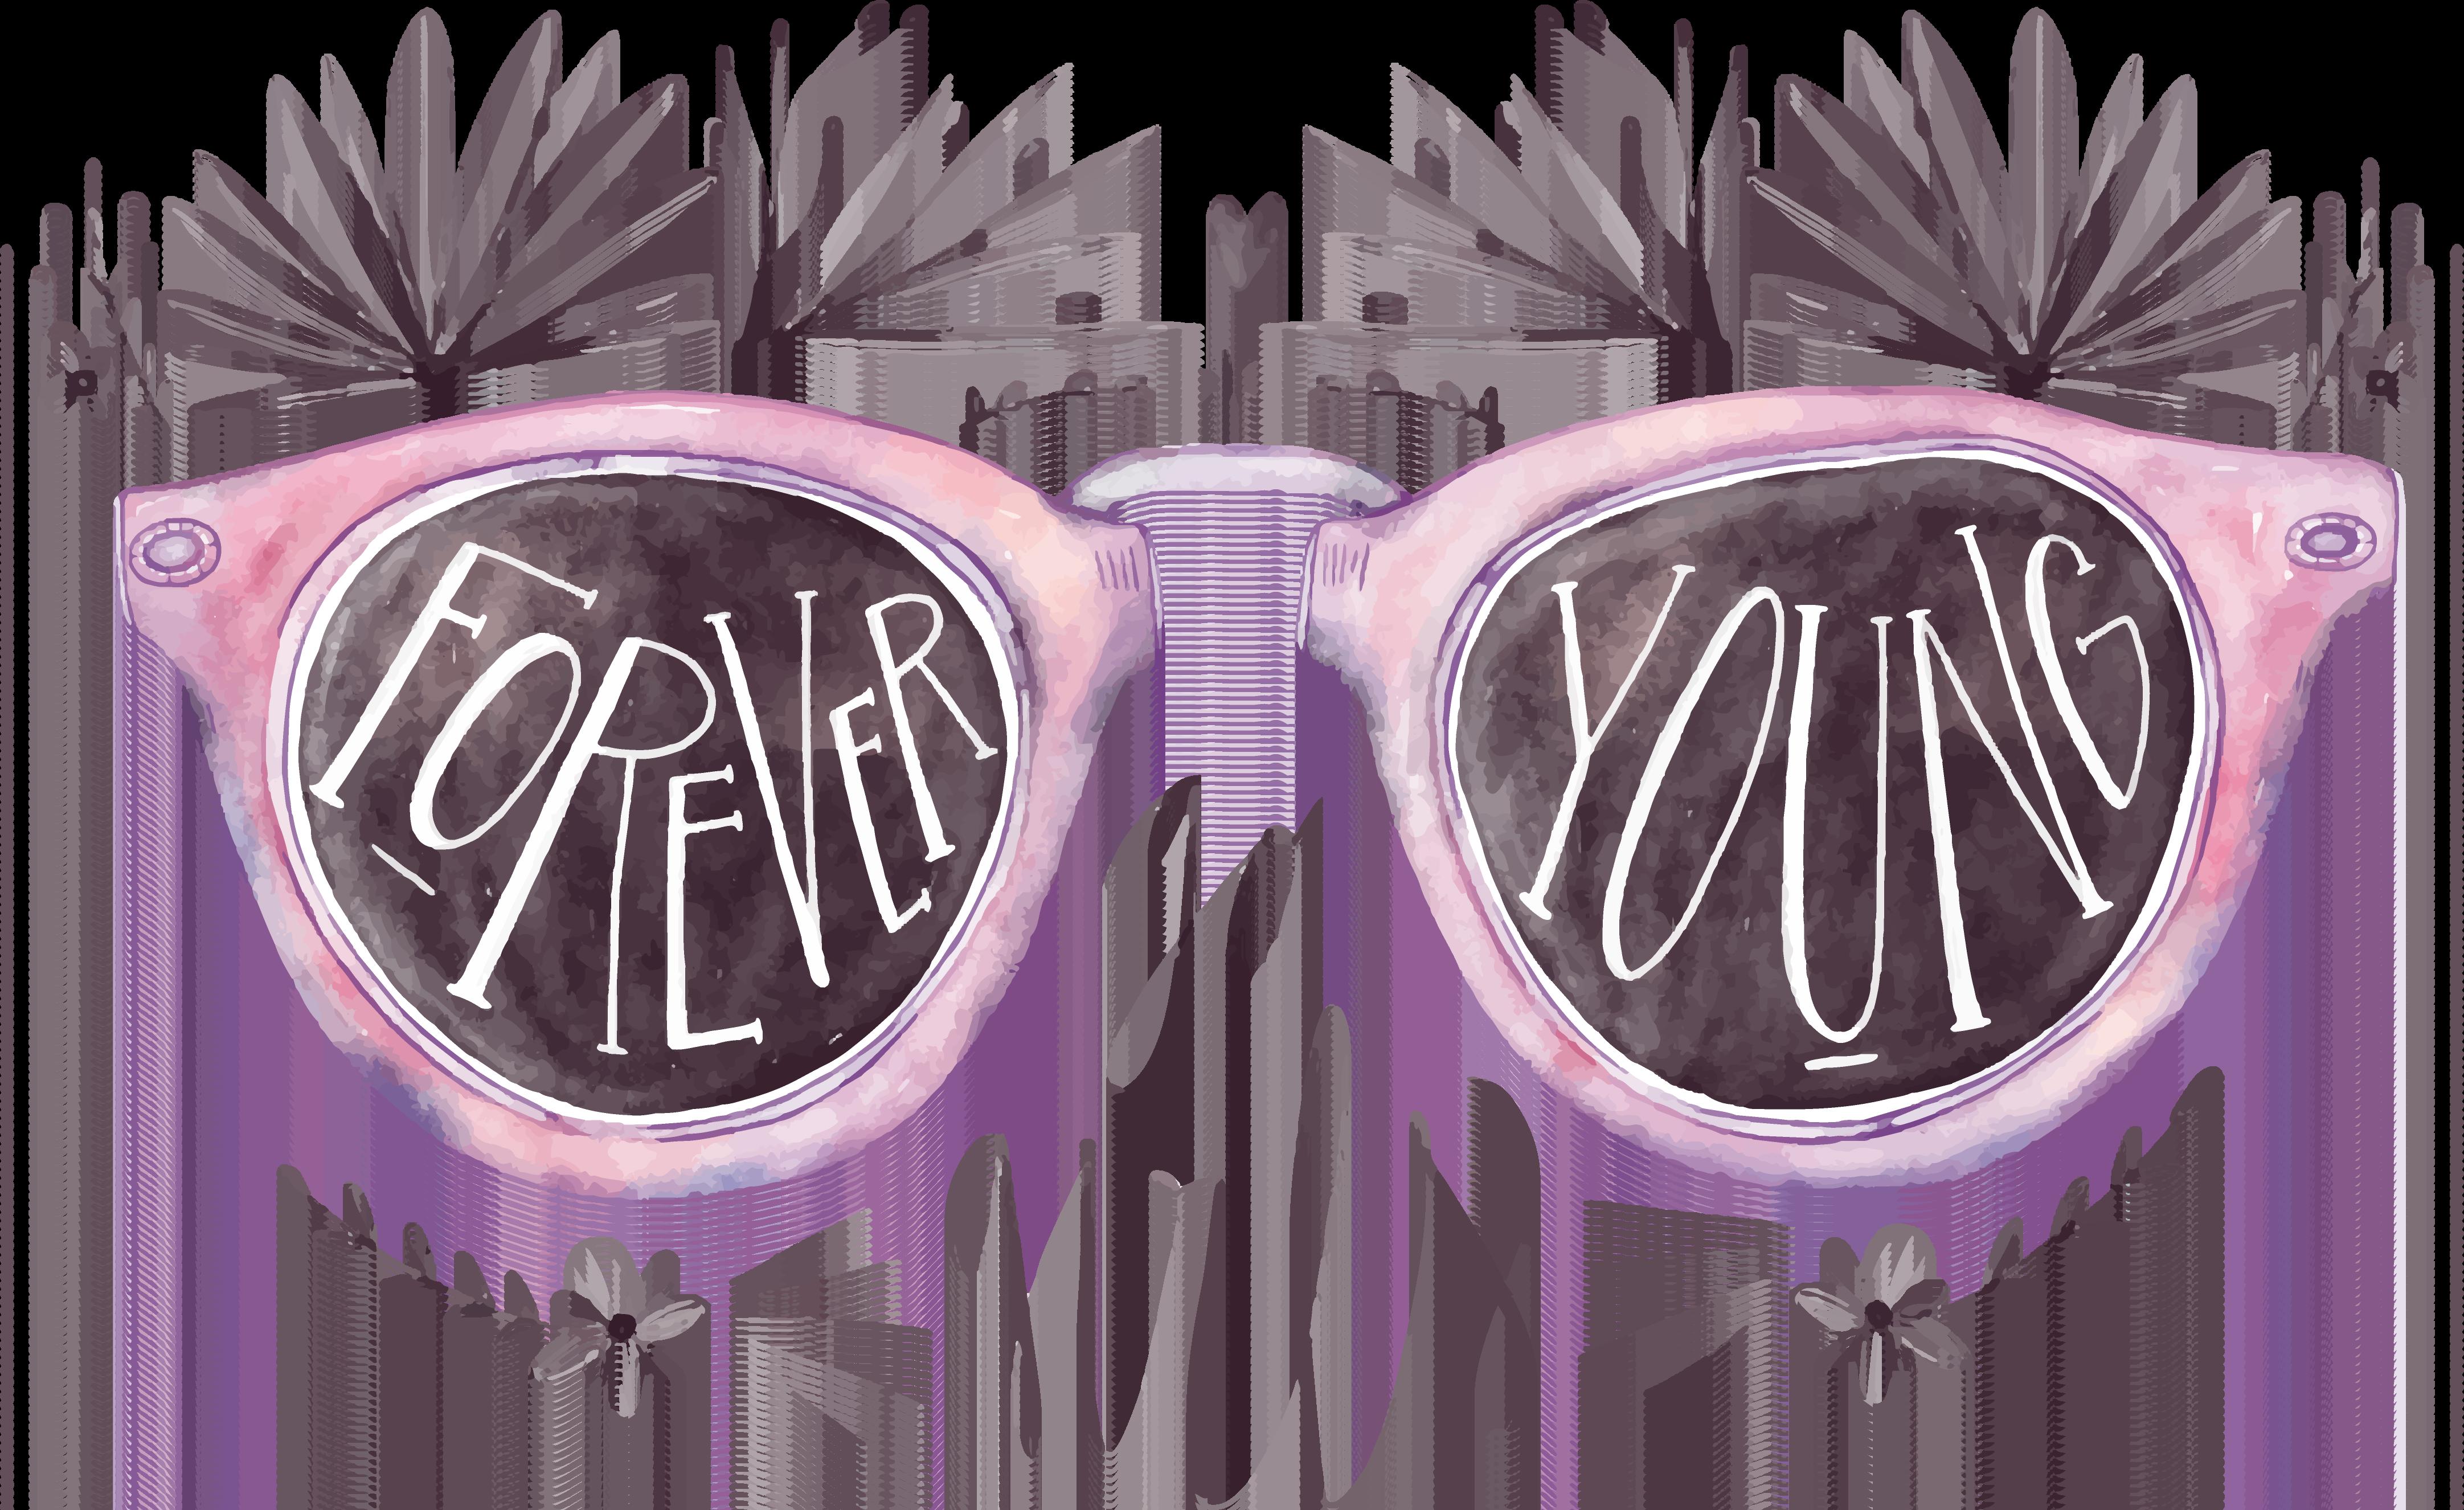 Sunglasses clipart stylish. Download free transparent image